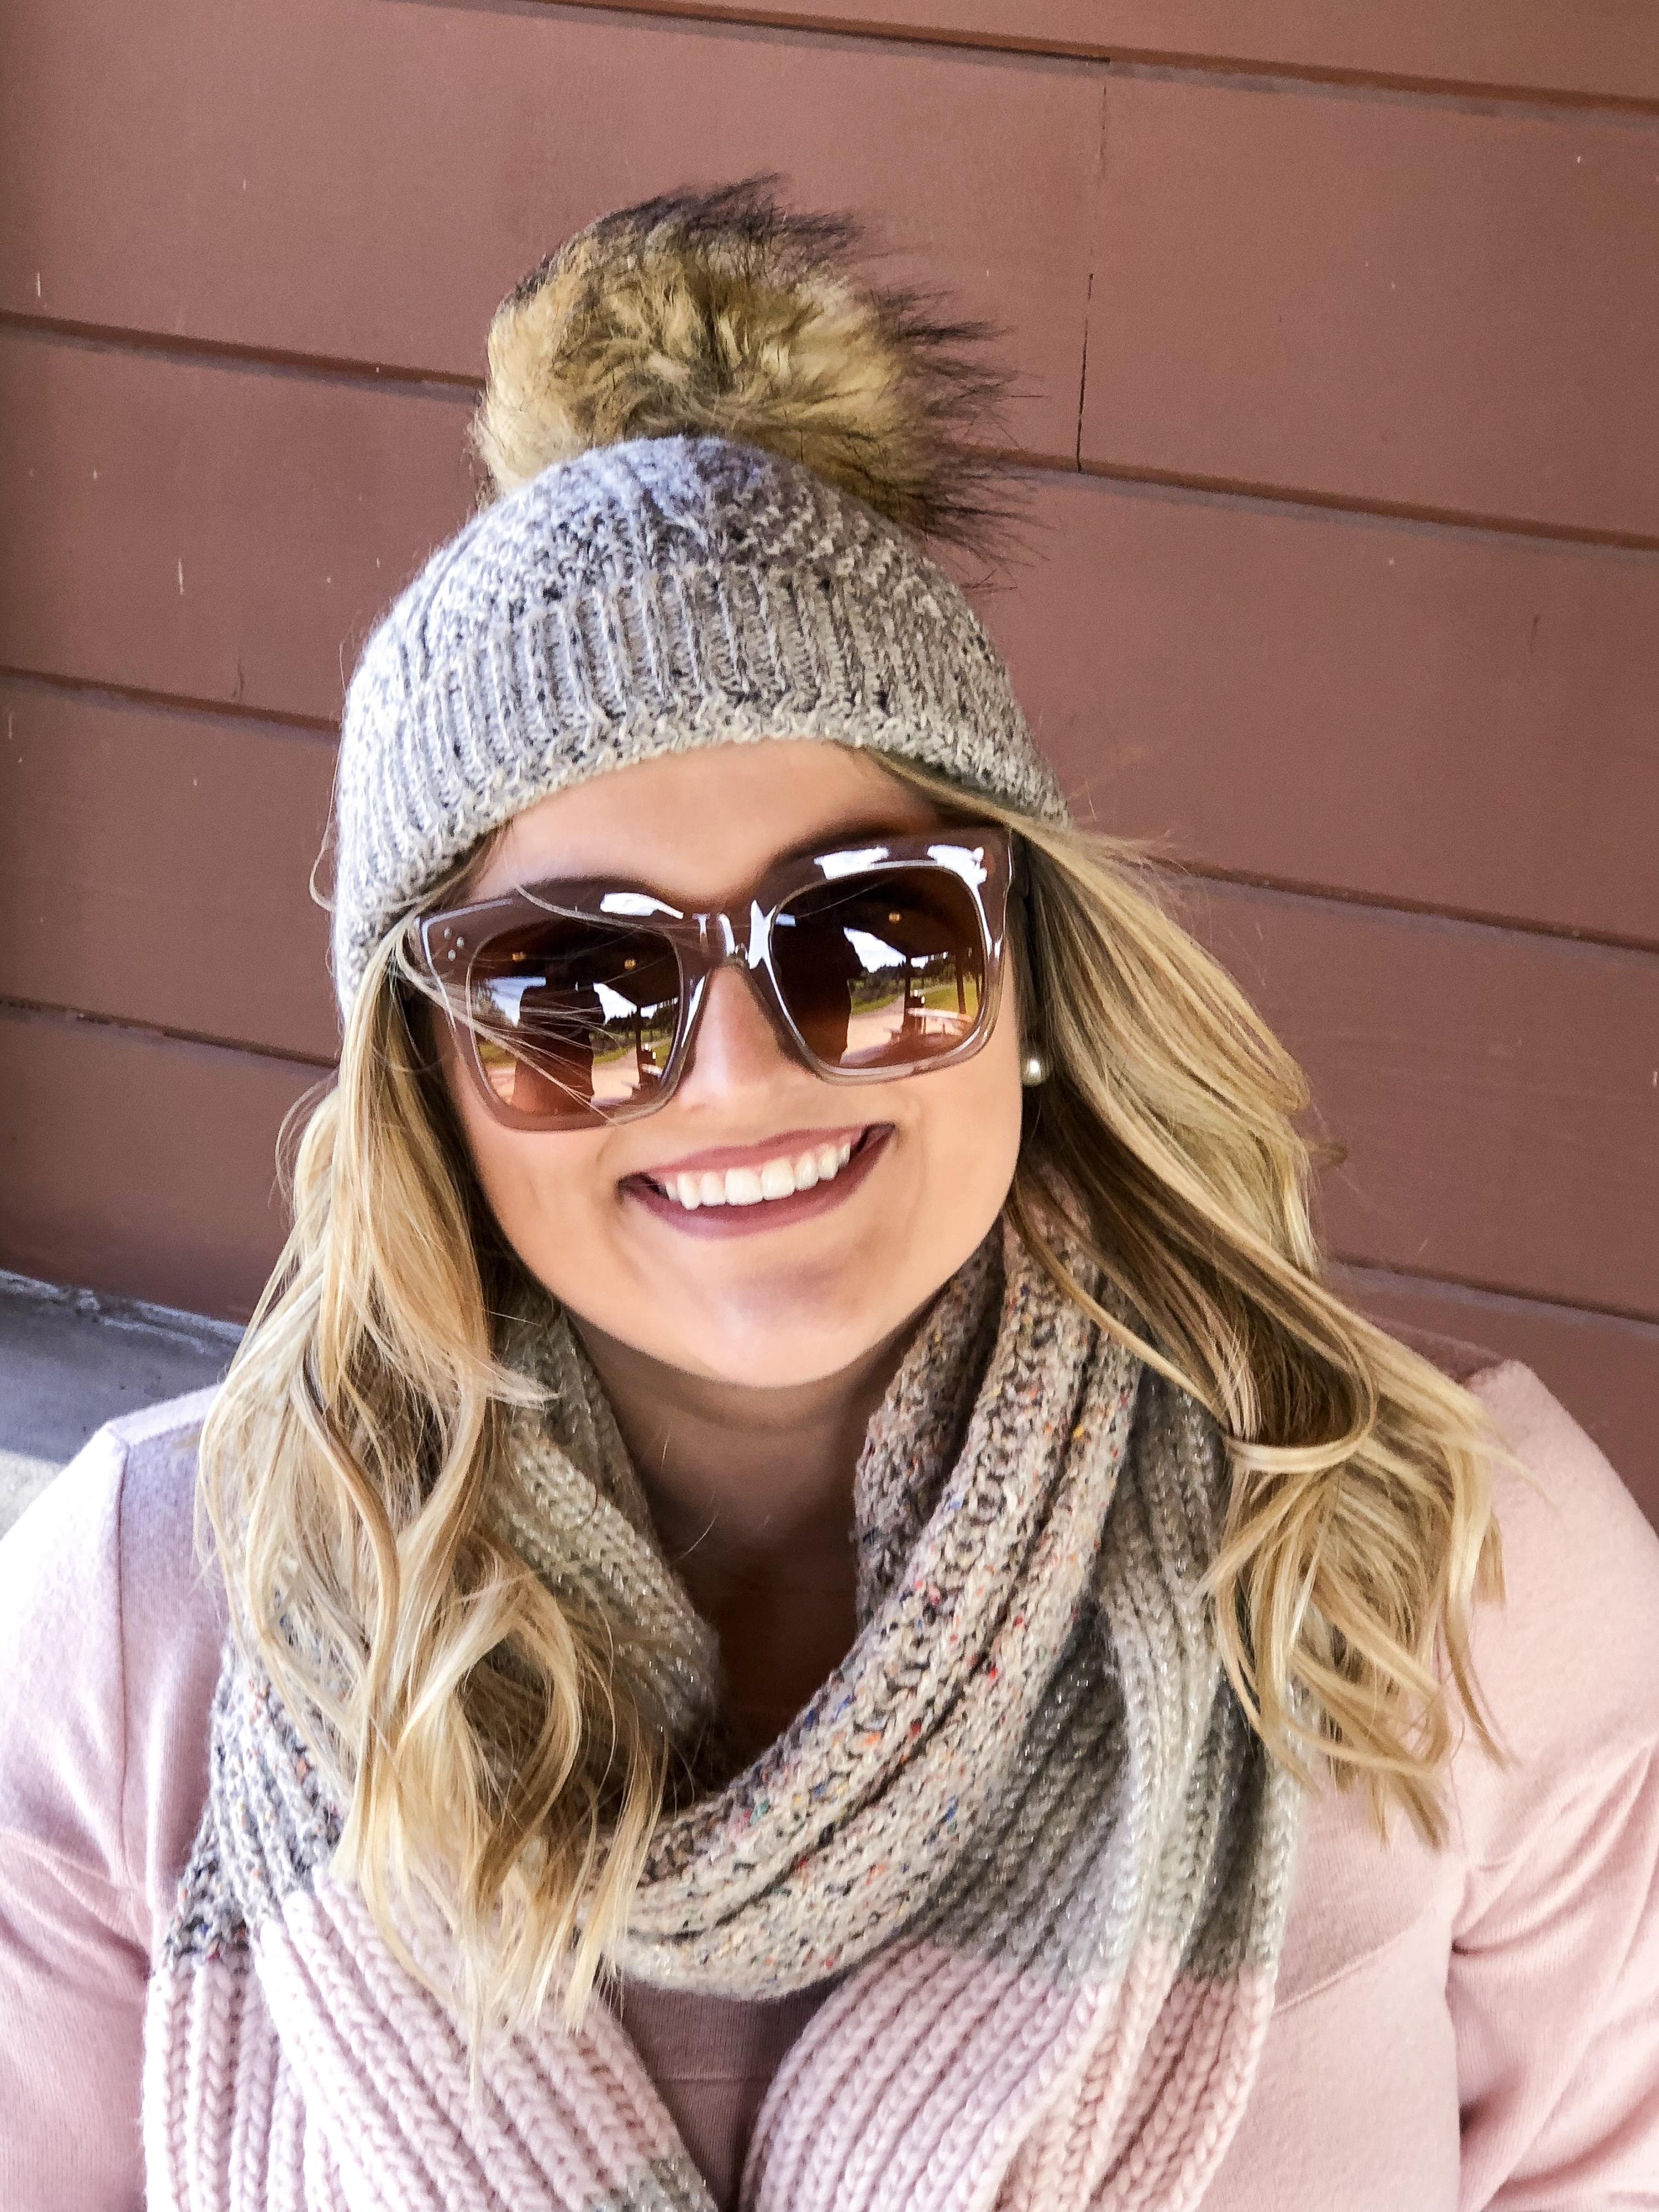 Megan is sunglasses - Classically Clad